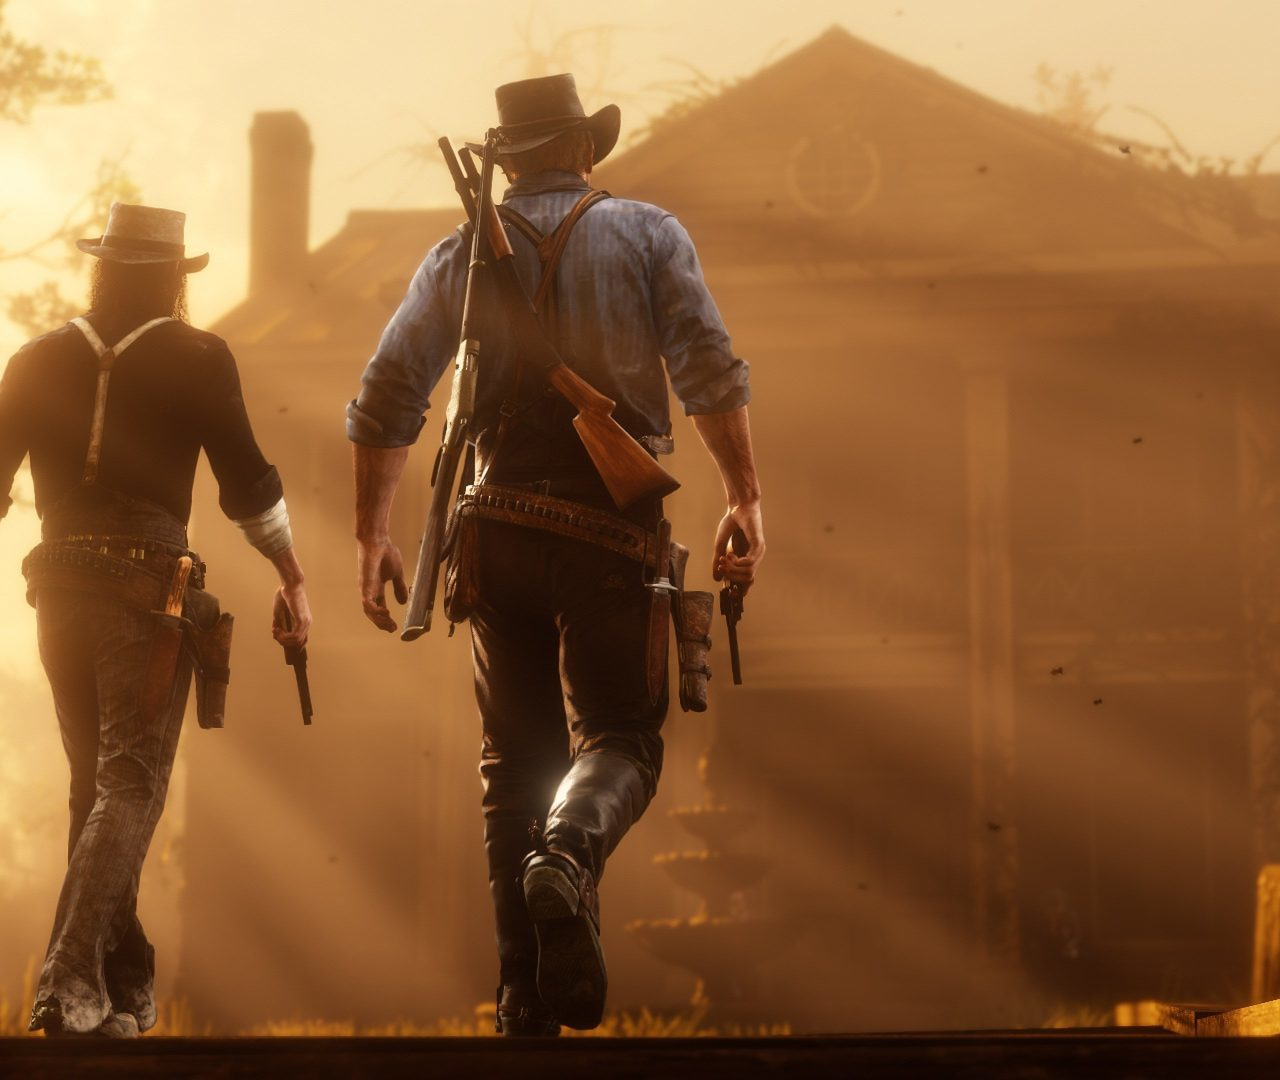 Red Dead Redemption Wallpaper Hd: Red Dead Redemption 2 Desktop Wallpapers 8